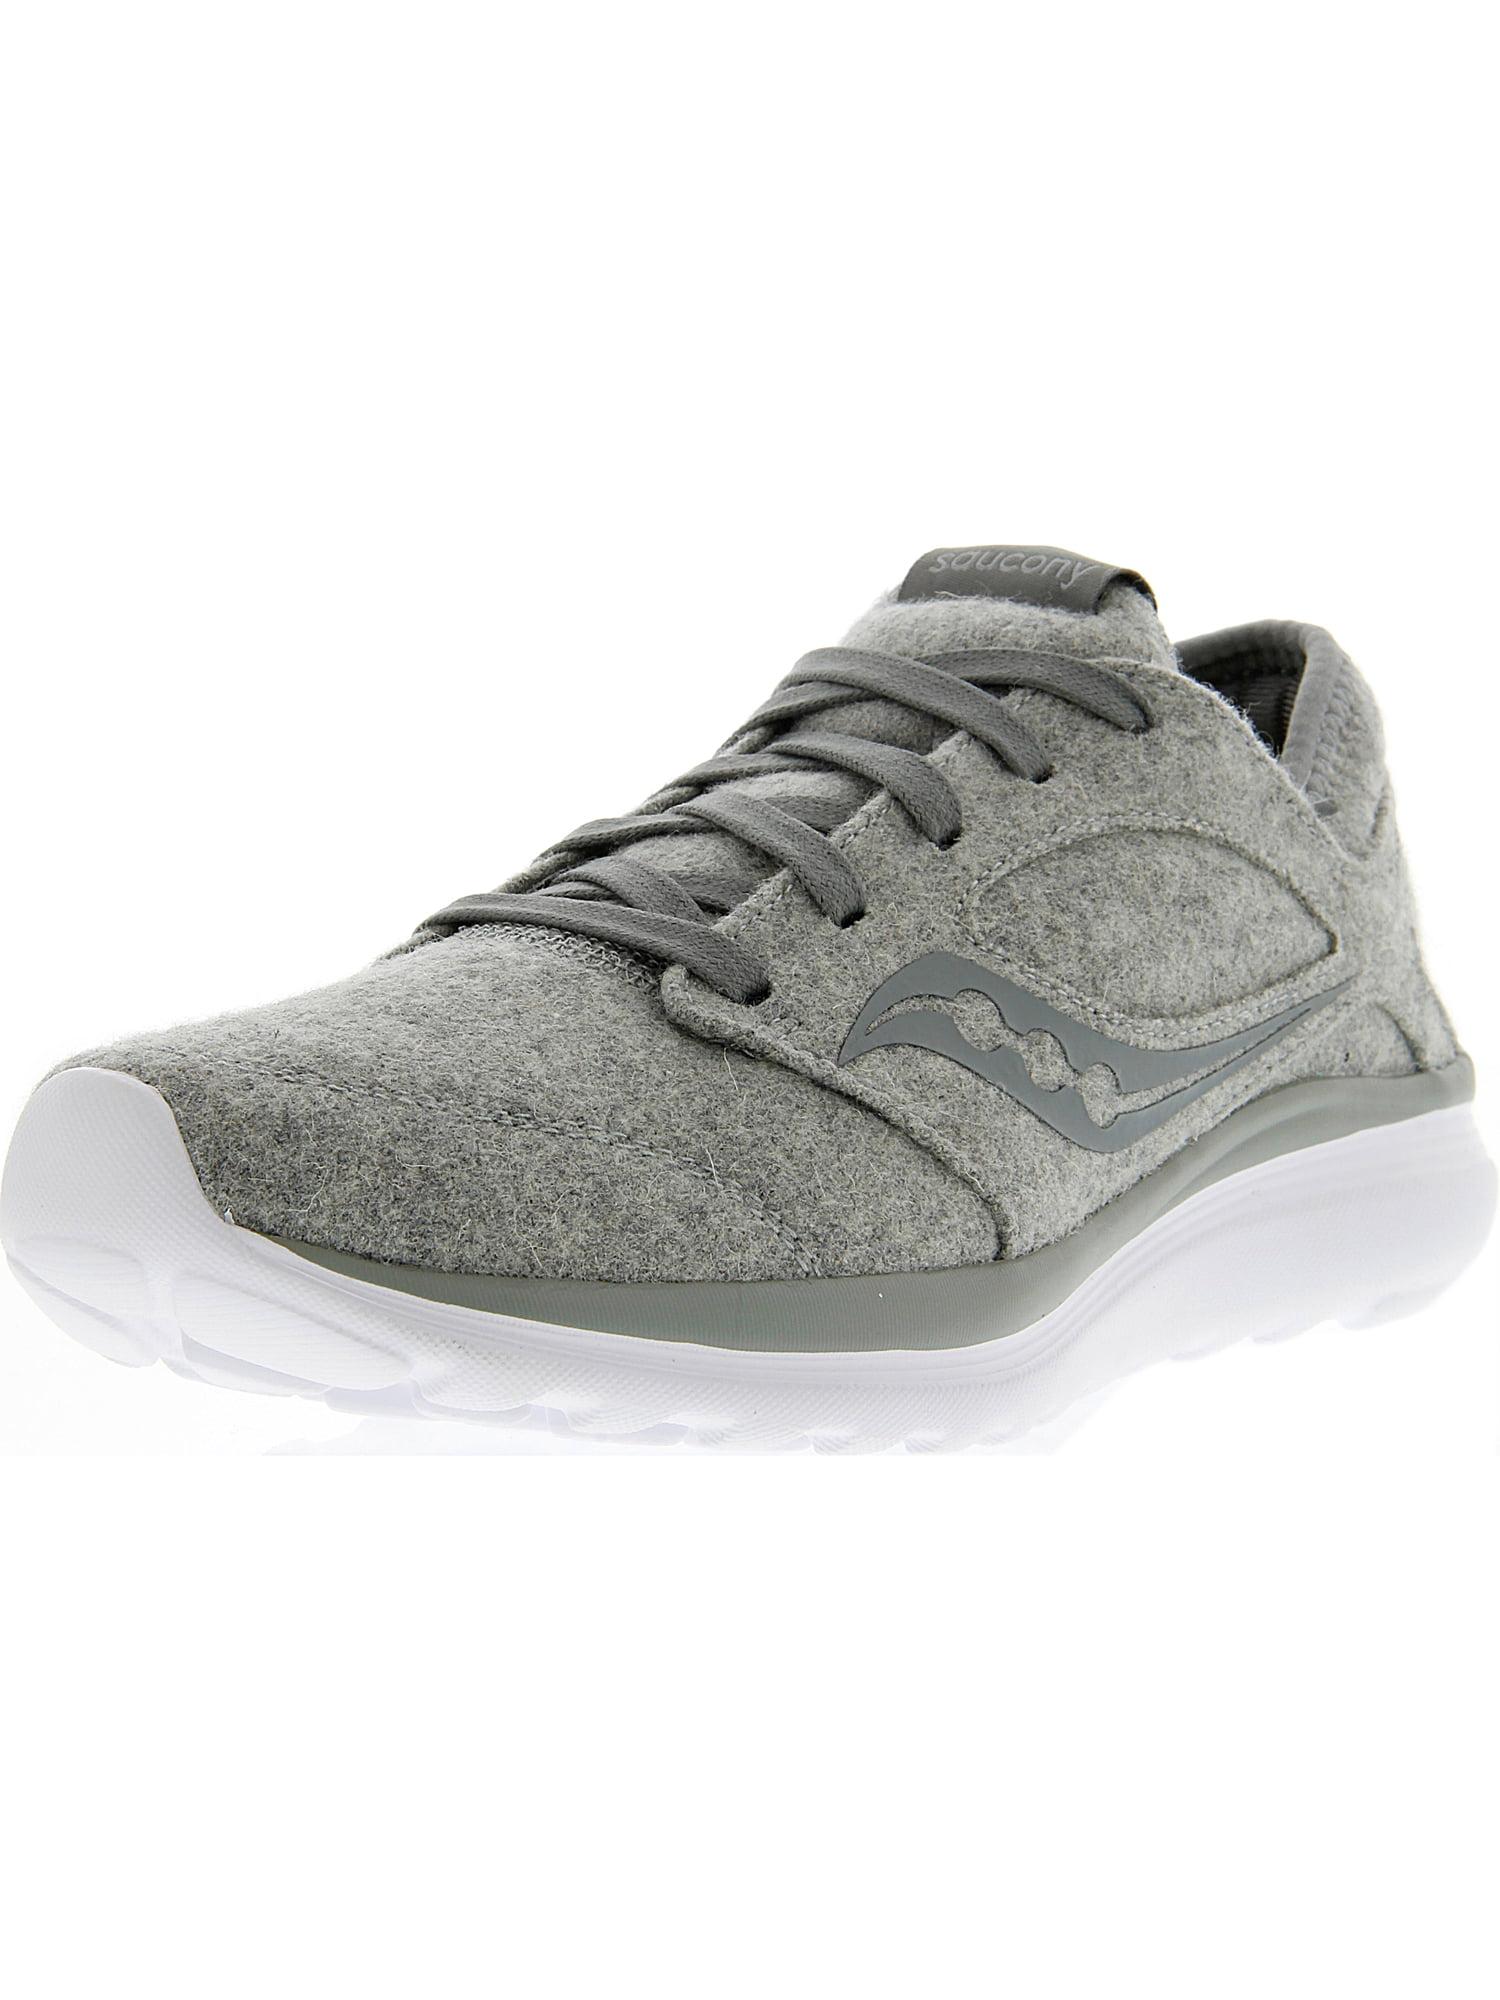 Saucony Women's Kineta Relay Wool Grey Ankle-High Running Shoe - 9M